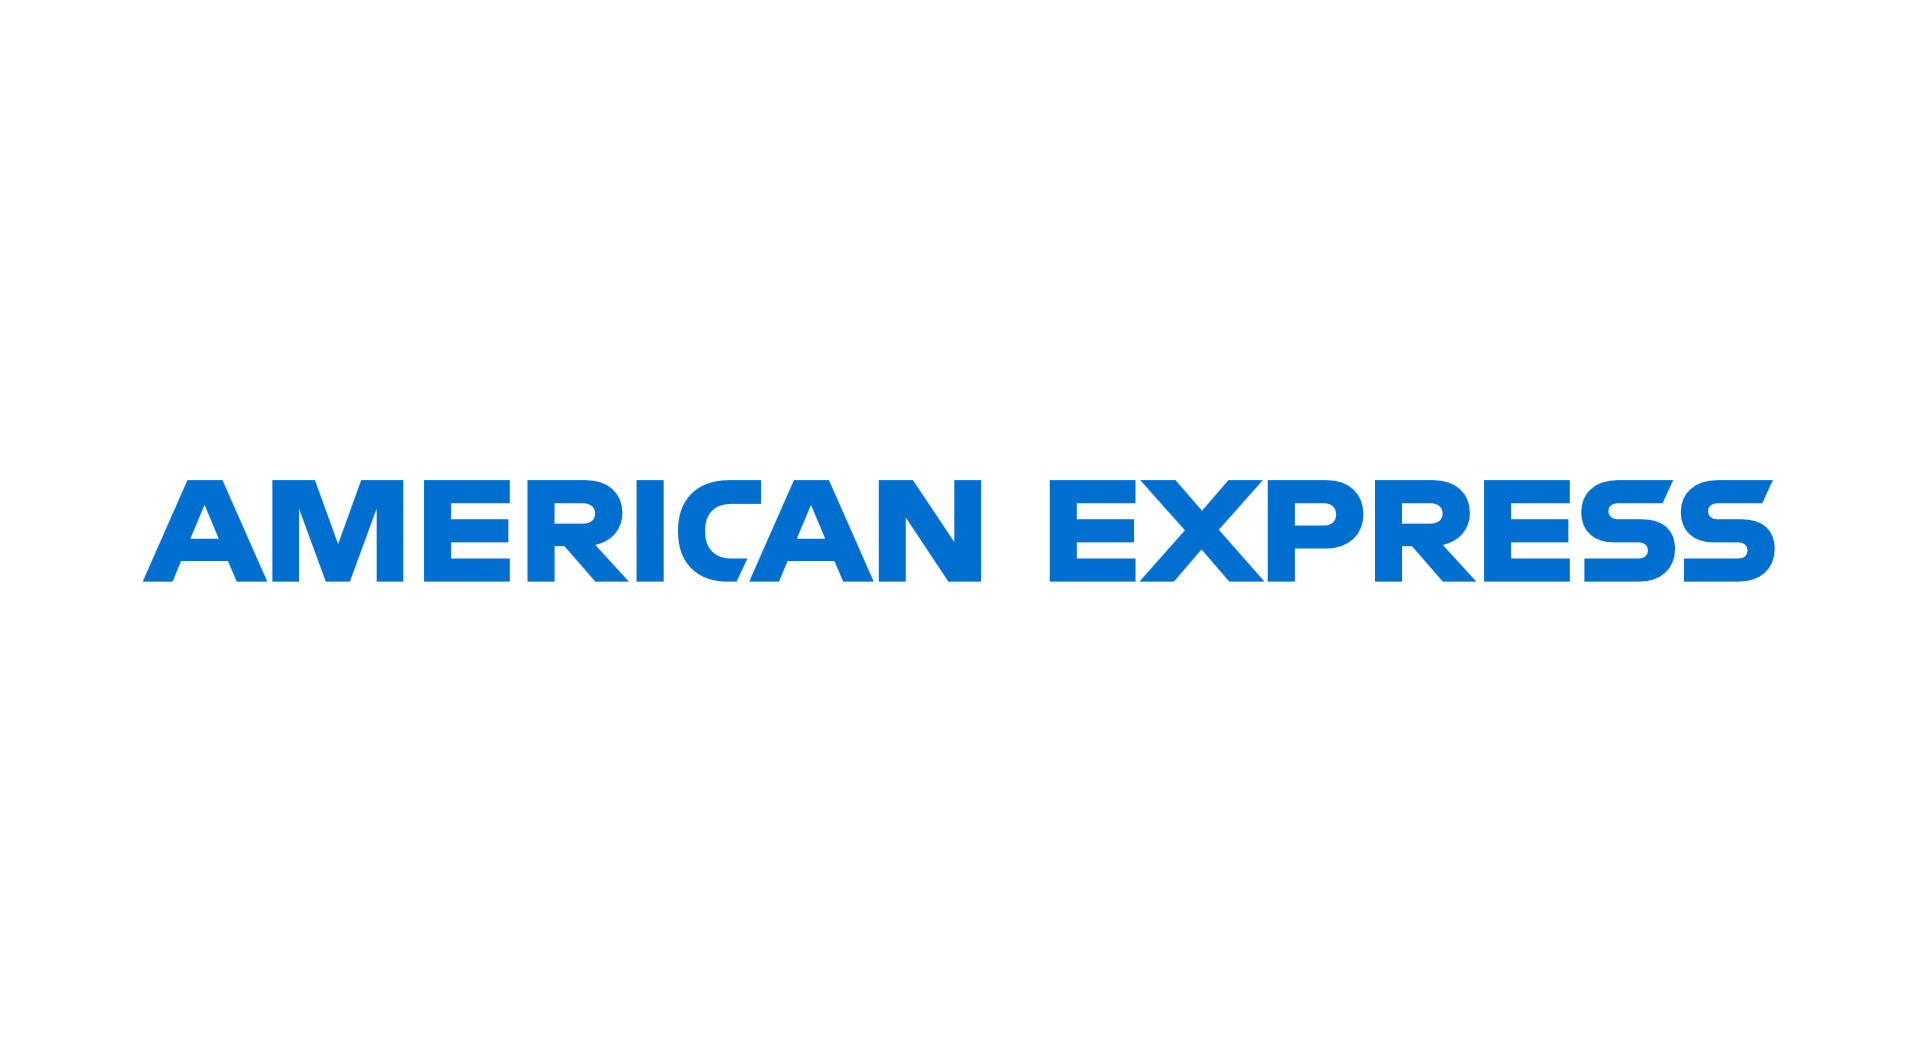 American Express MGM #3 logo